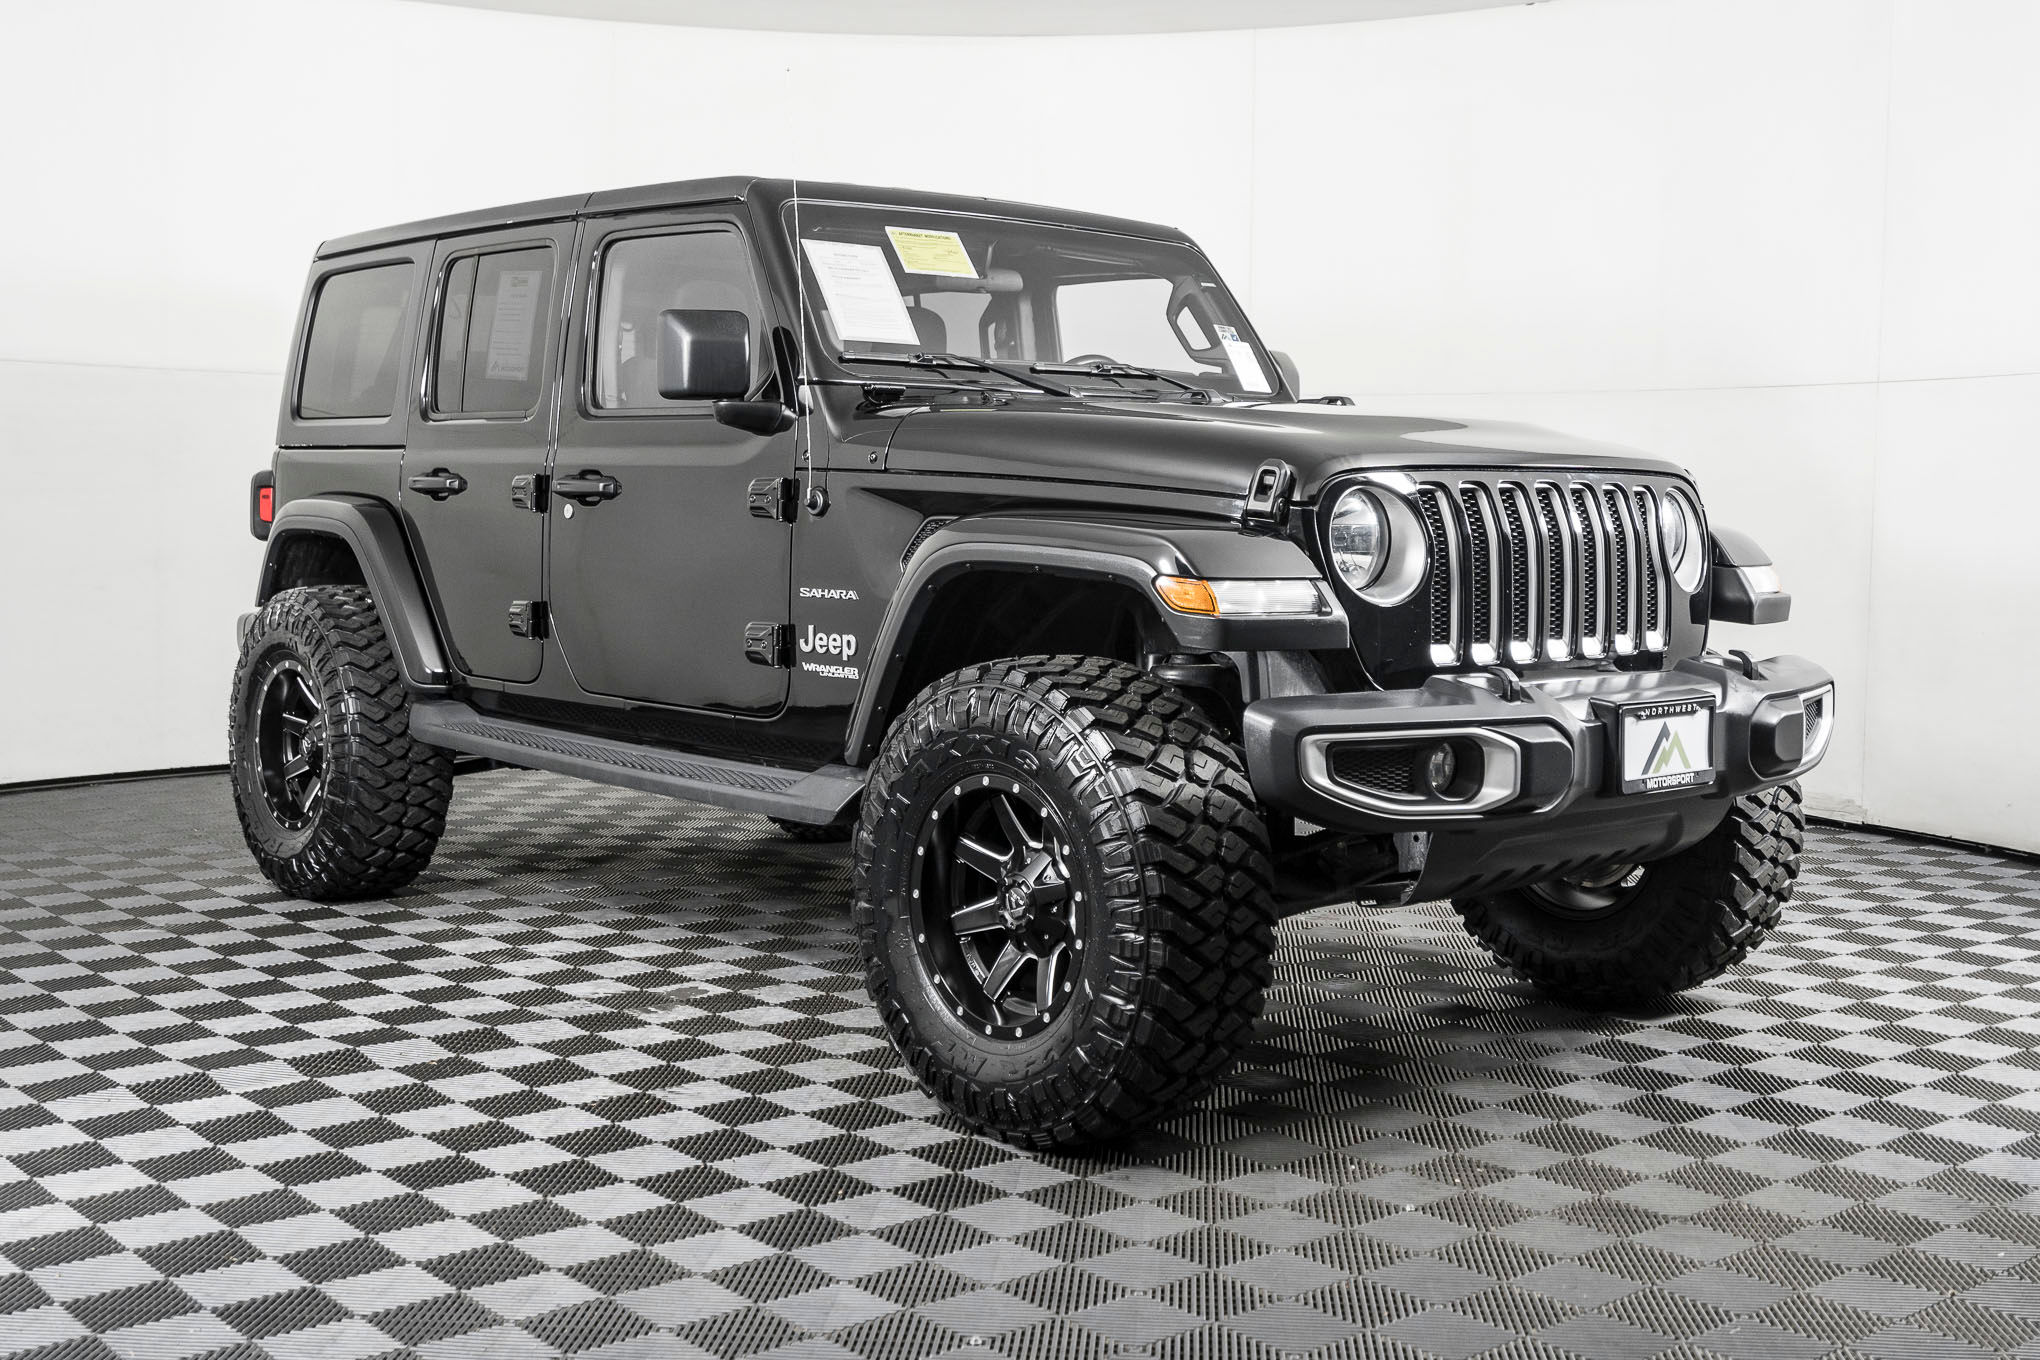 Used Lifted 2020 Jeep Wrangler Unlimited Sahara 4x4 Suv For Sale Northwest Motorsport